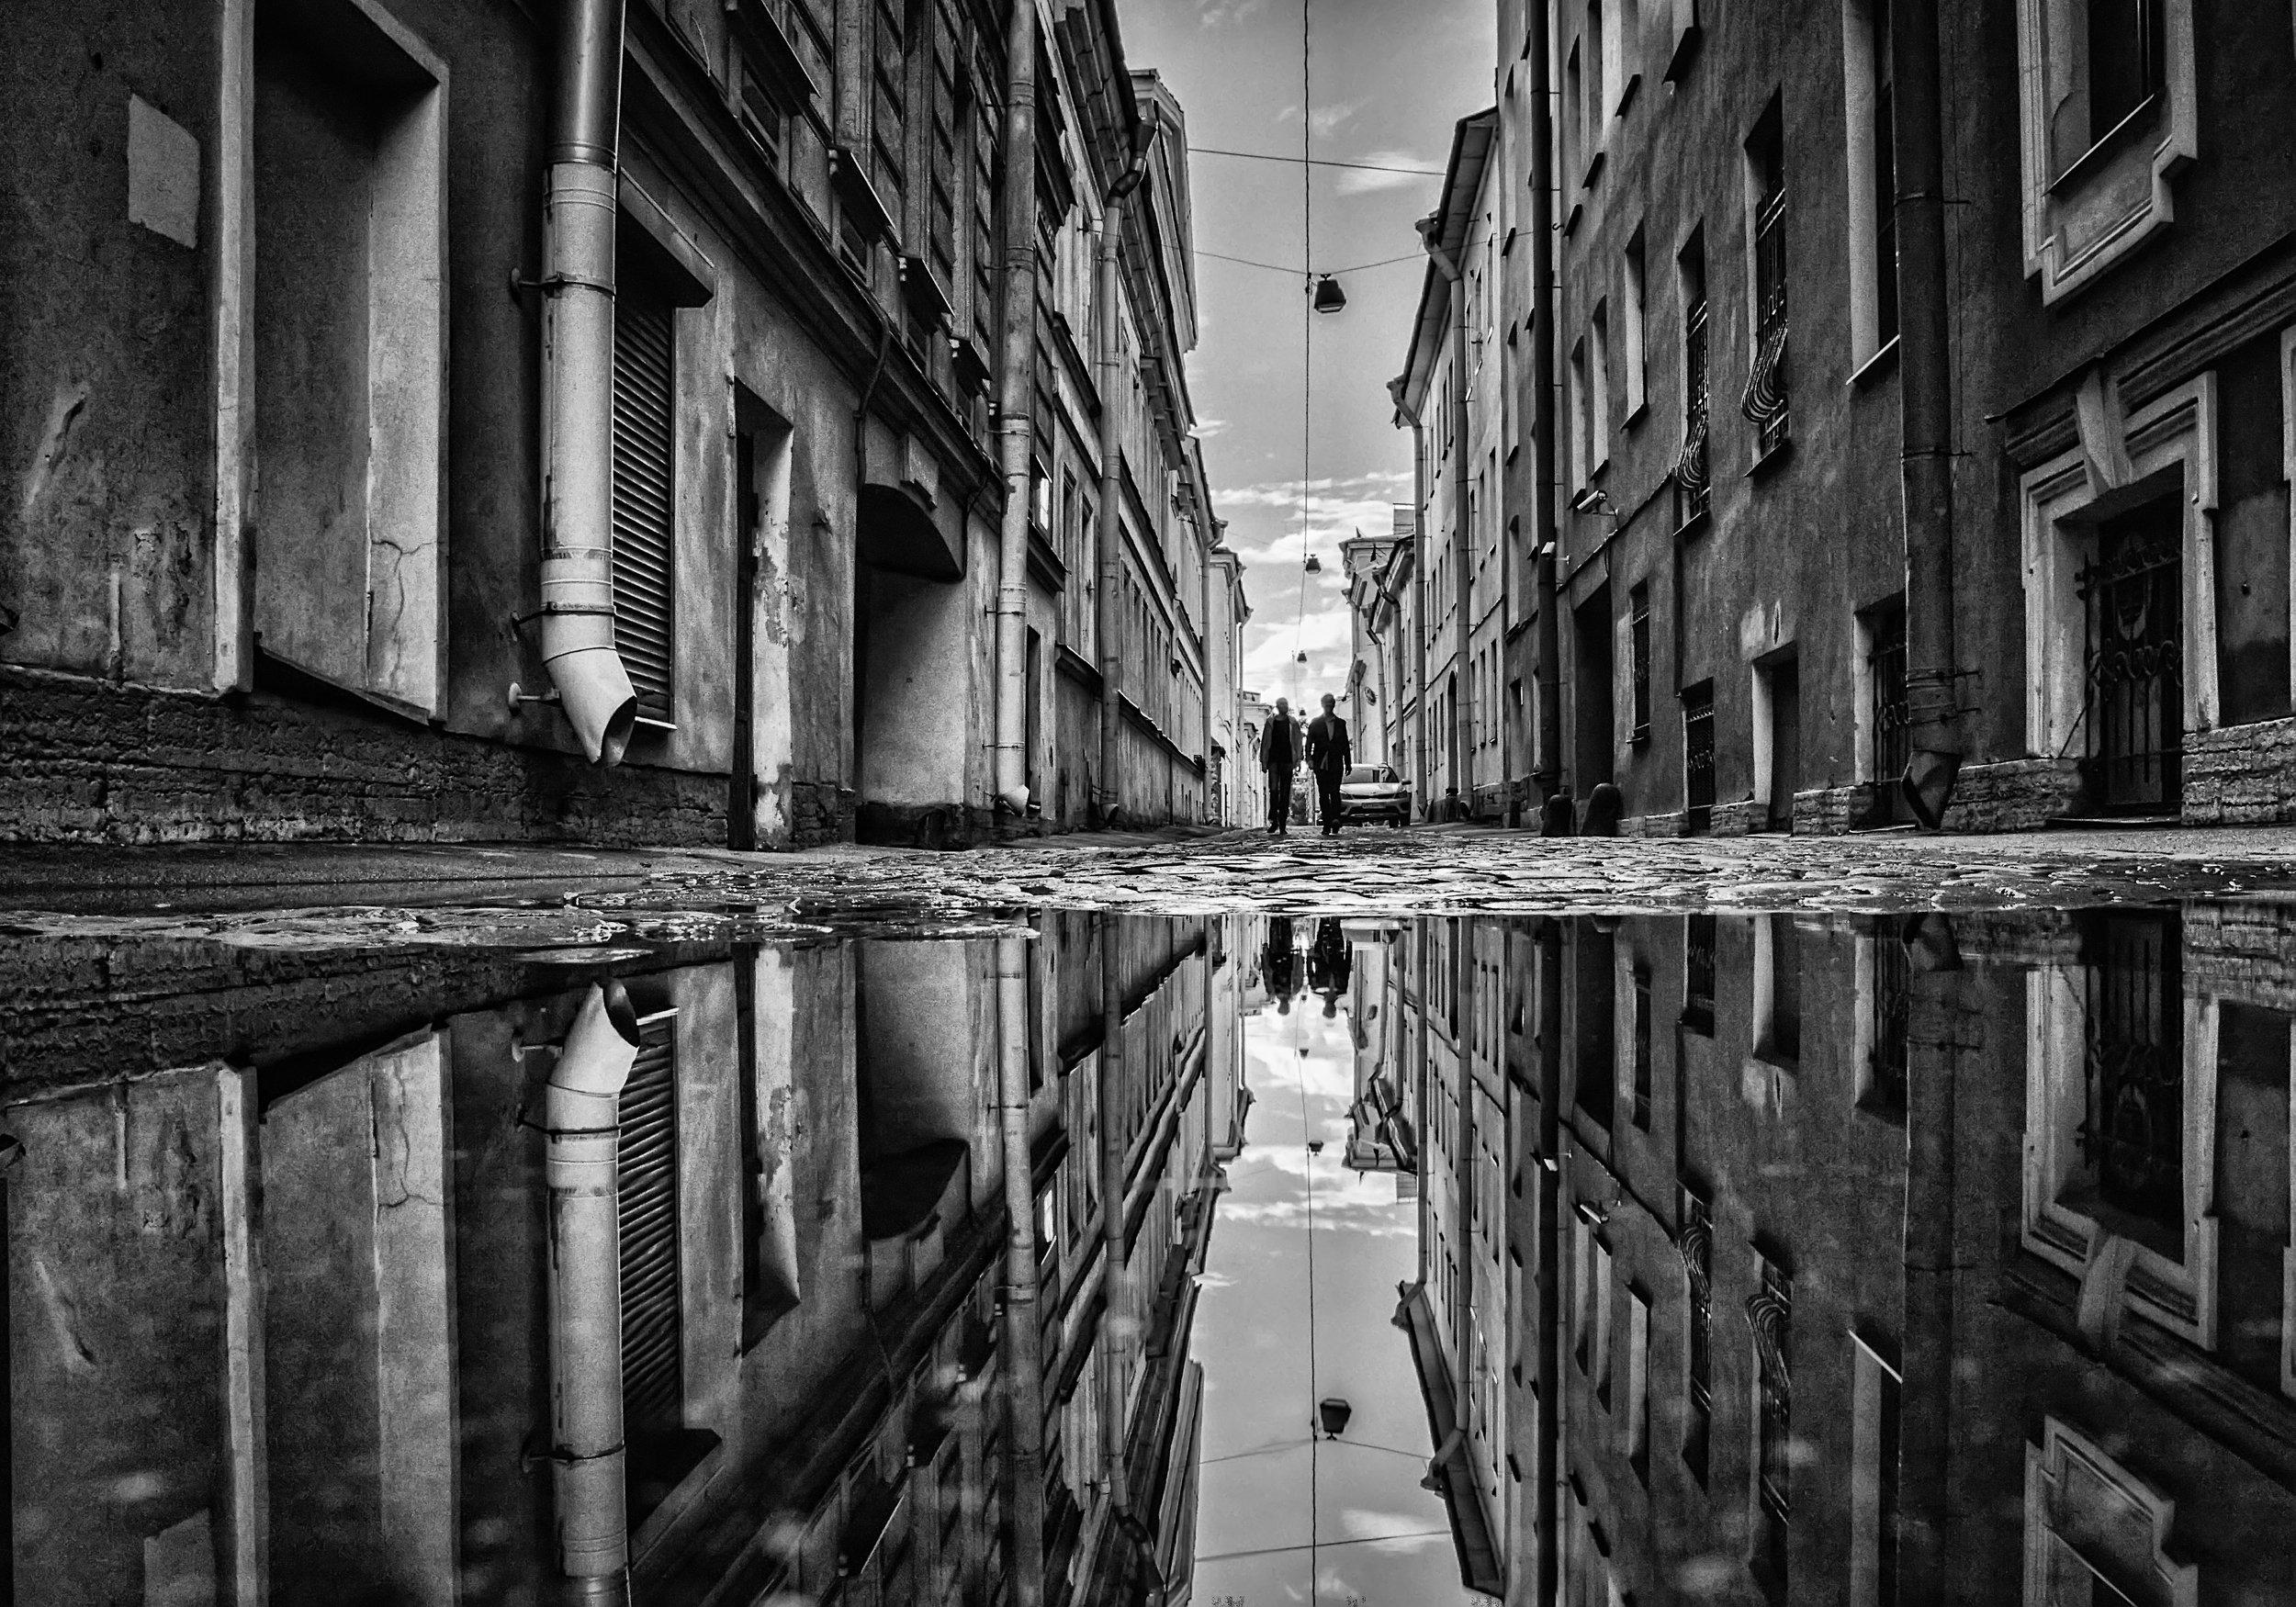 город,улица,петербург,архитектура,отражения,лужа, Тамара